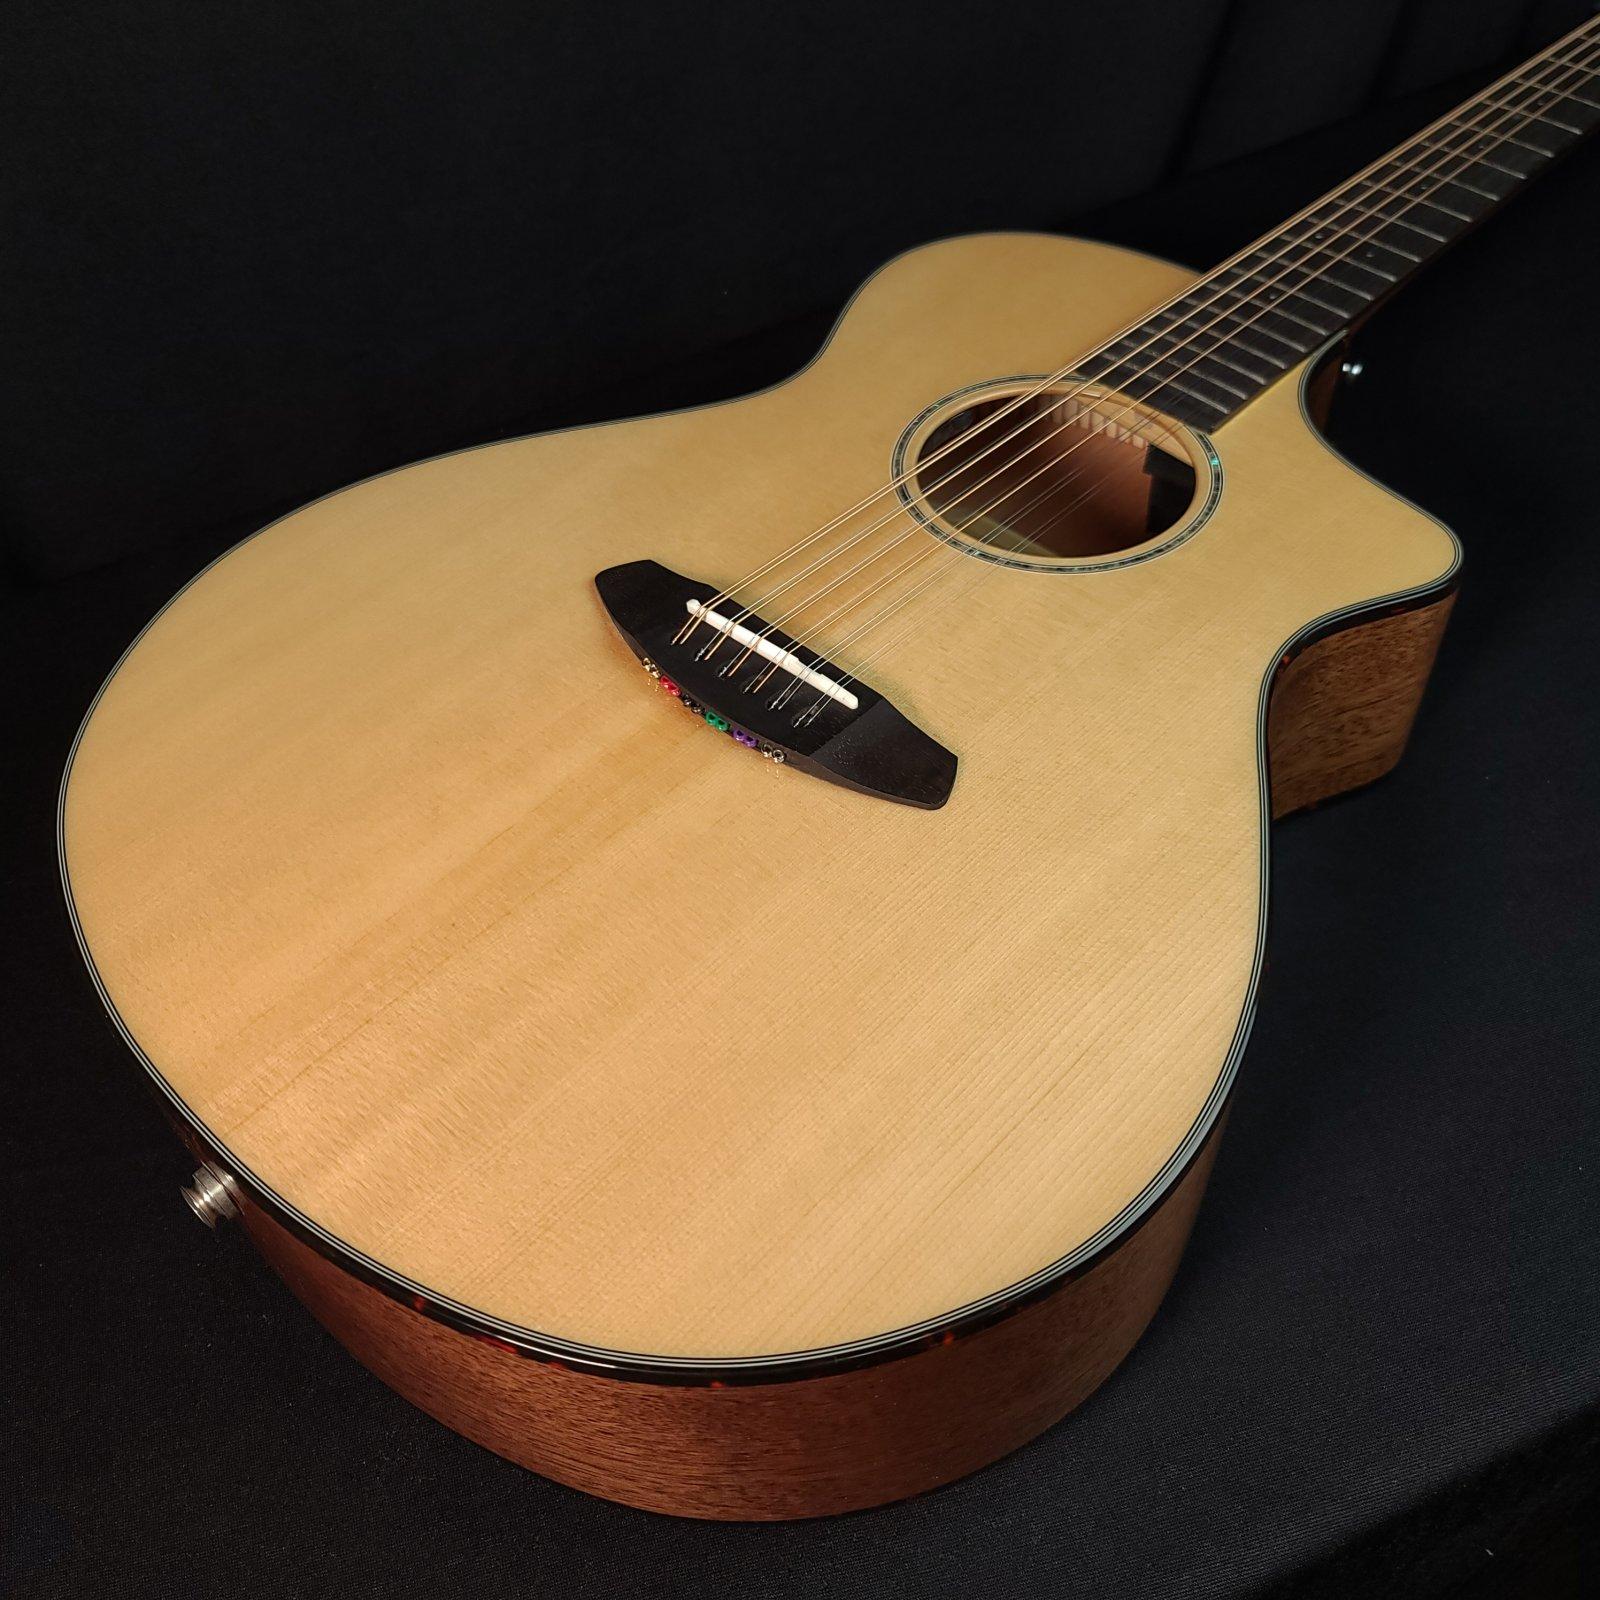 Breedlove Pursuit Concert 12-String Cutaway Acoustic Electric Guitar